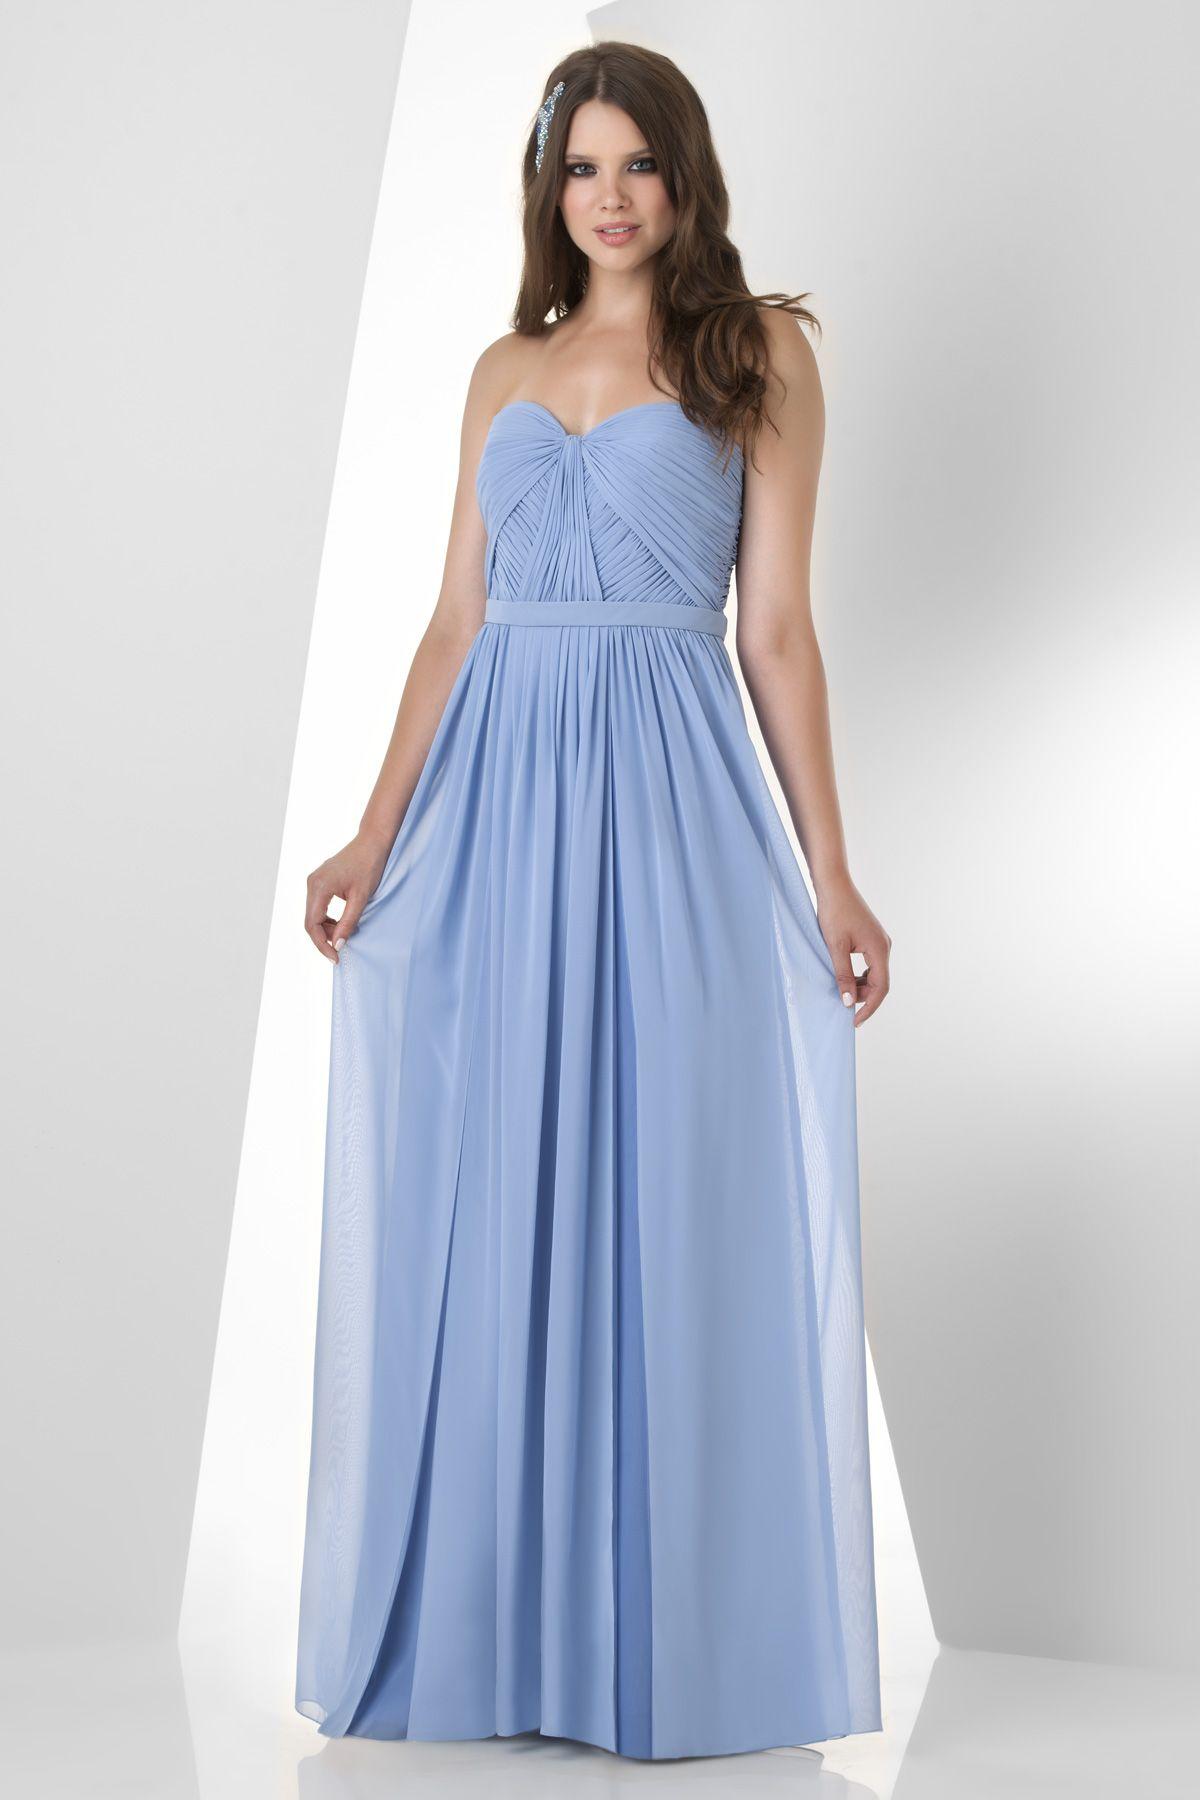 Bari Jay 886 | Bridesmaid Dresses | Pinterest | Bari jay, Bari and ...